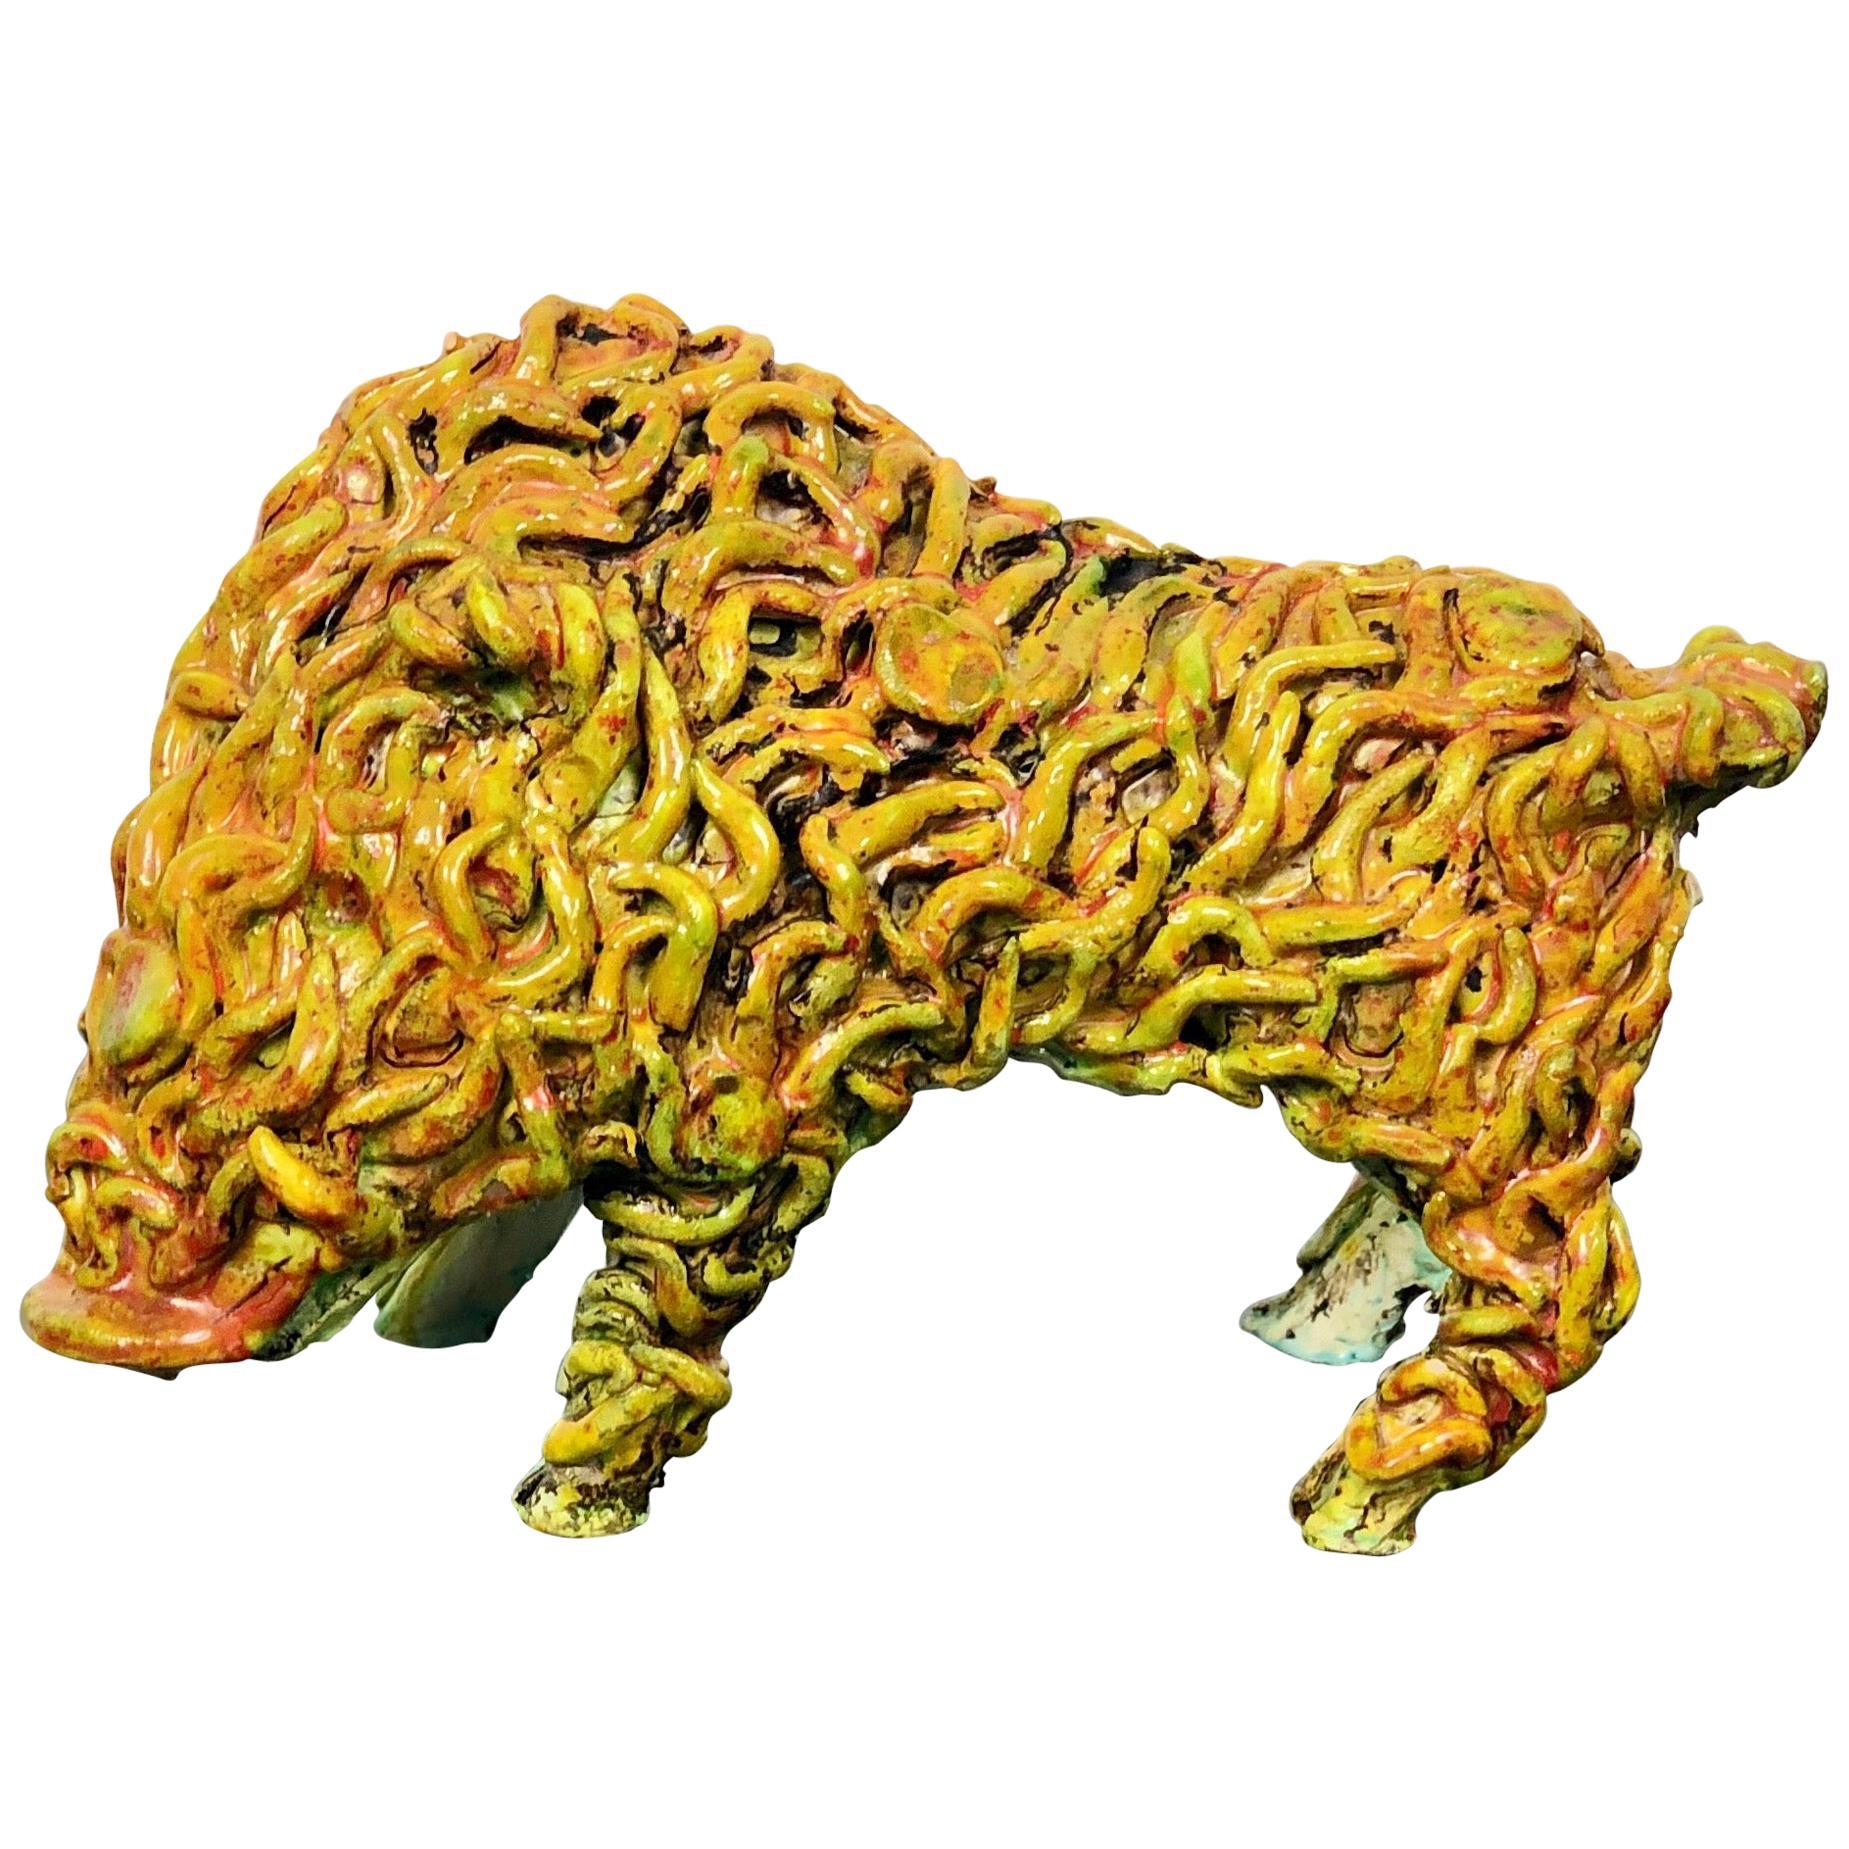 Gianluigi Mele Ceramic Boar Animal Sculpture, Italy, Sardinia, 1970s